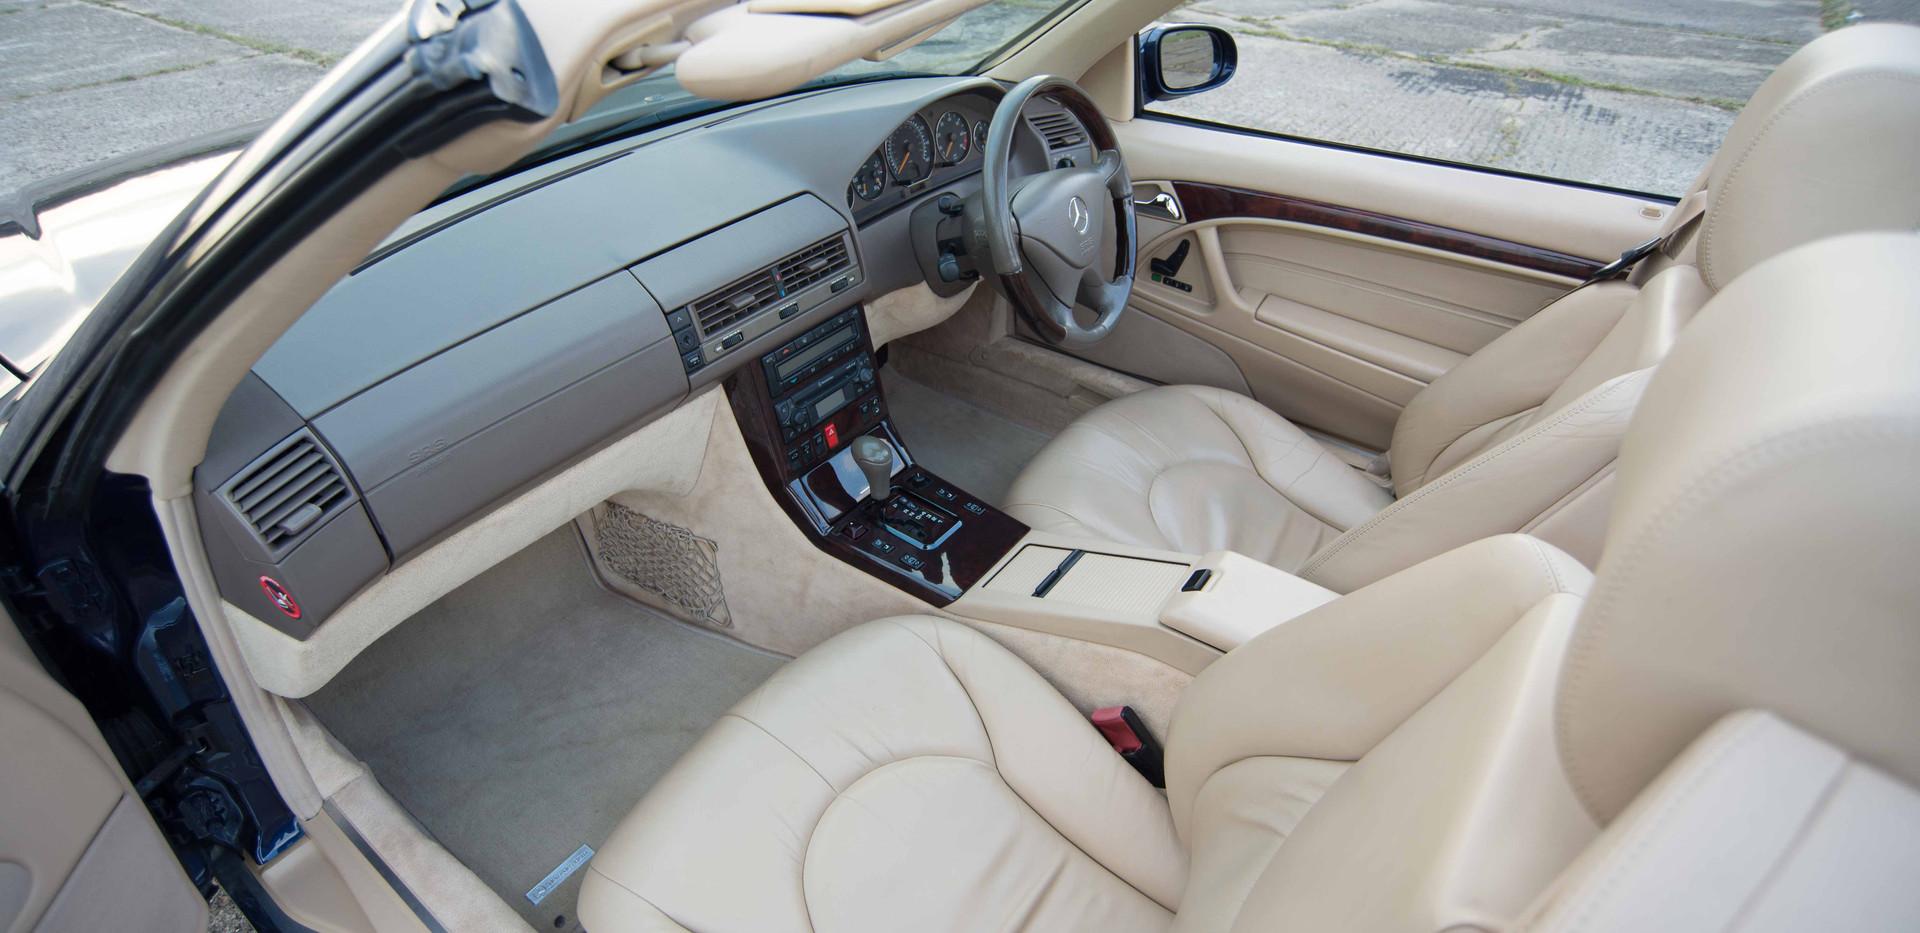 SL500 For Sale UK London  (30 of 36).jpg